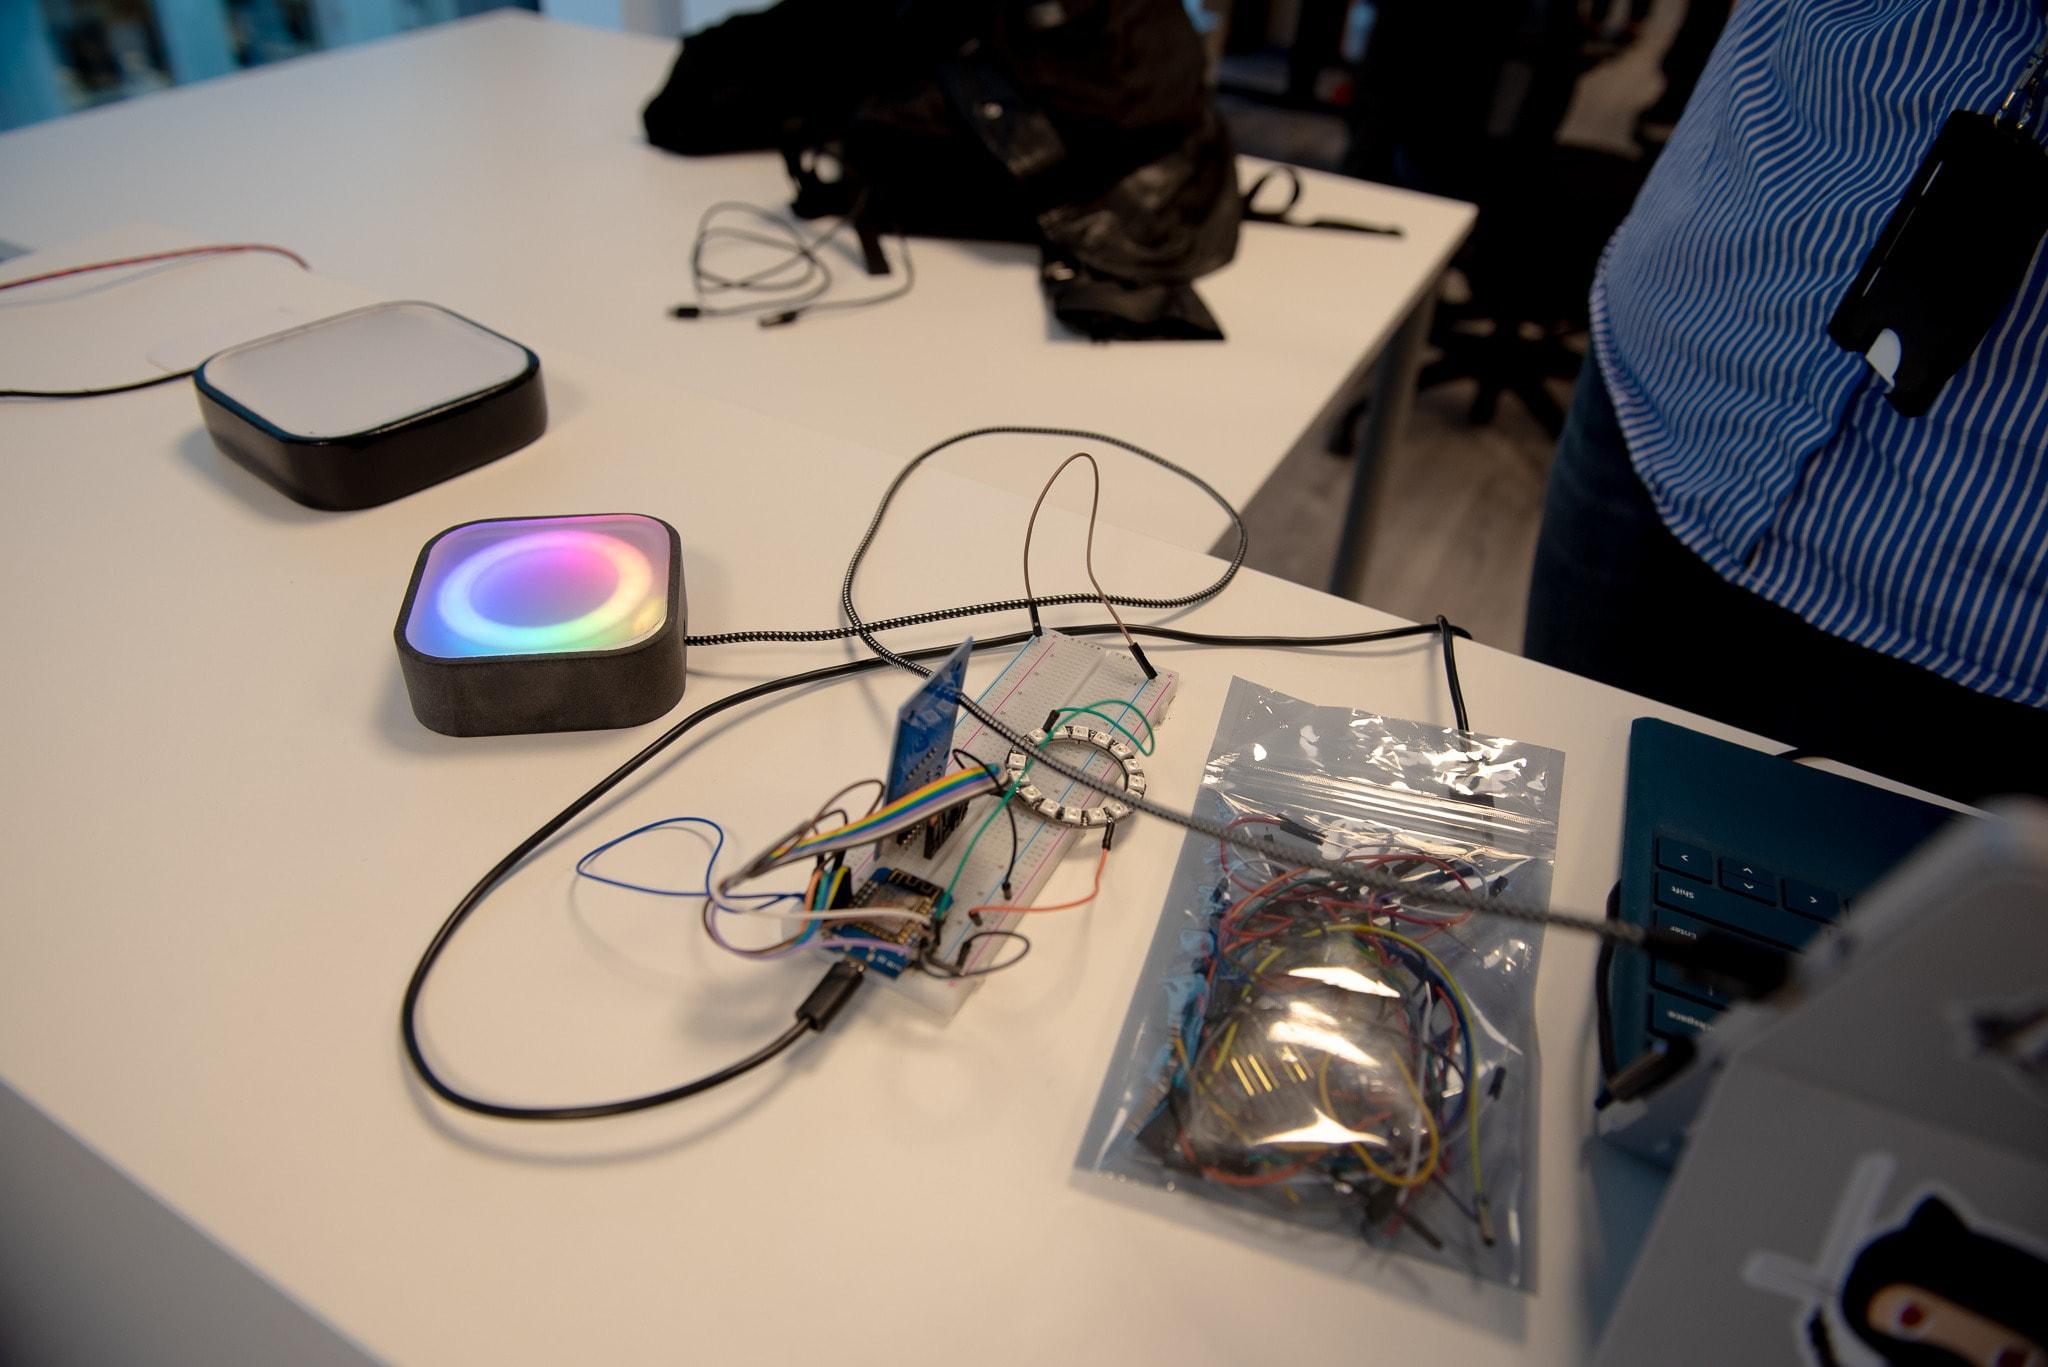 Technology, Gadget, Electronics